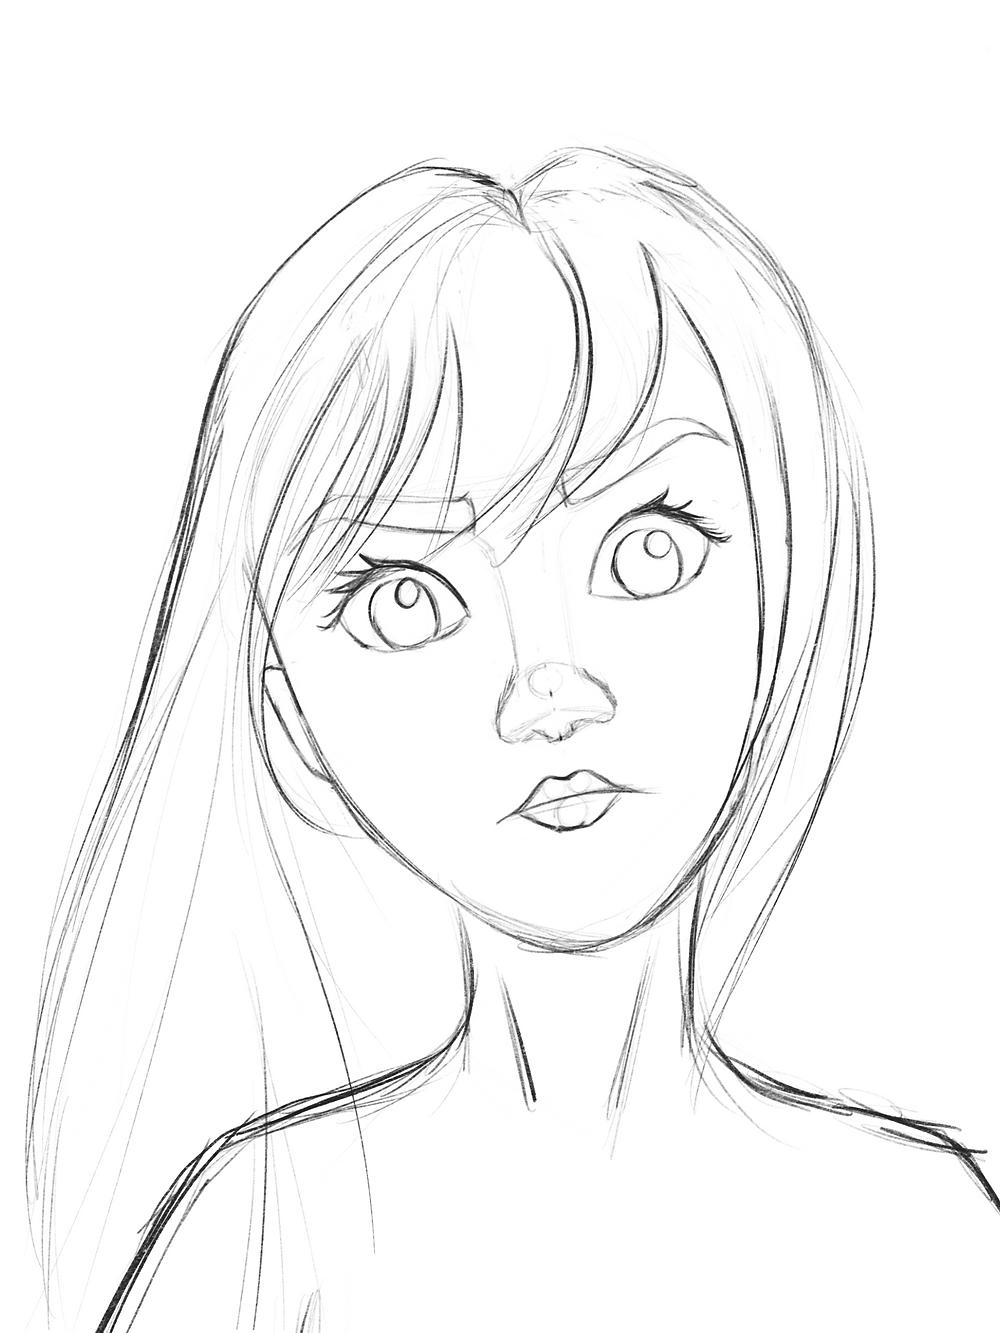 procreate-girl-sketch